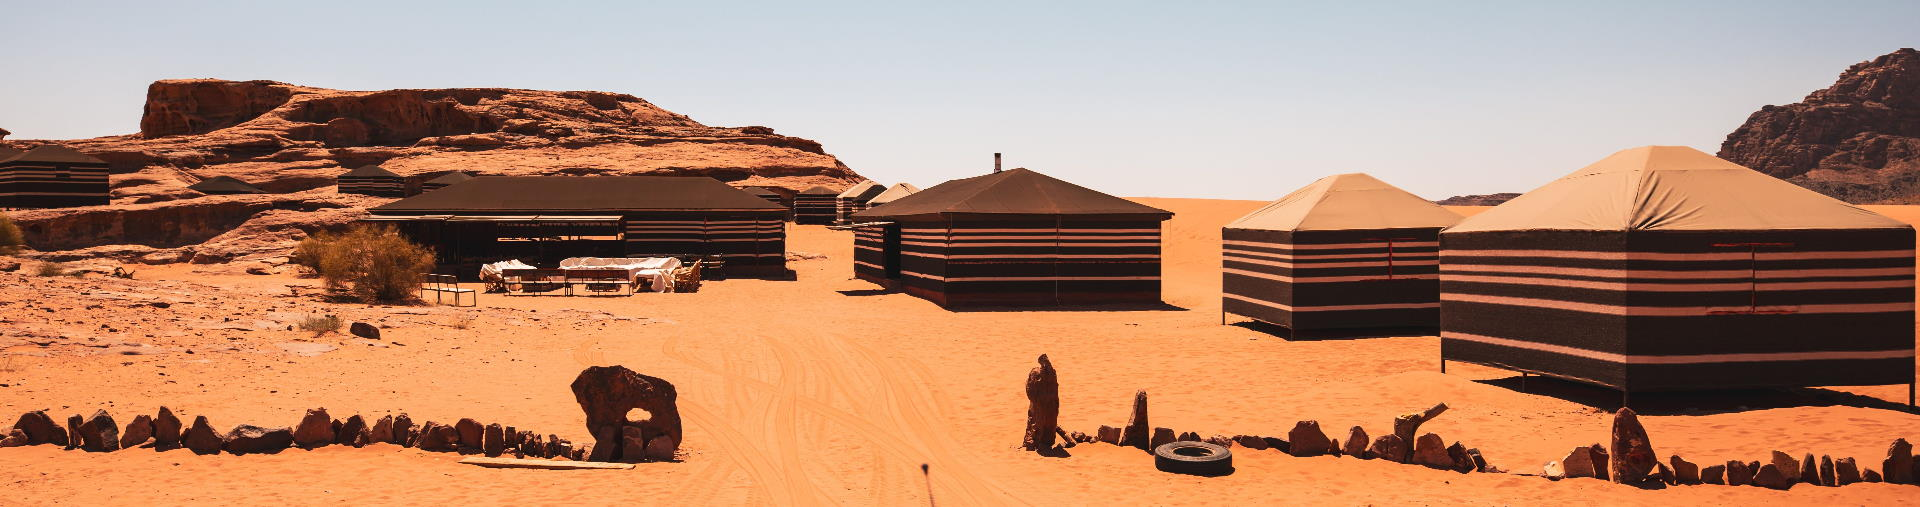 Traditional Bedouin campsite petra